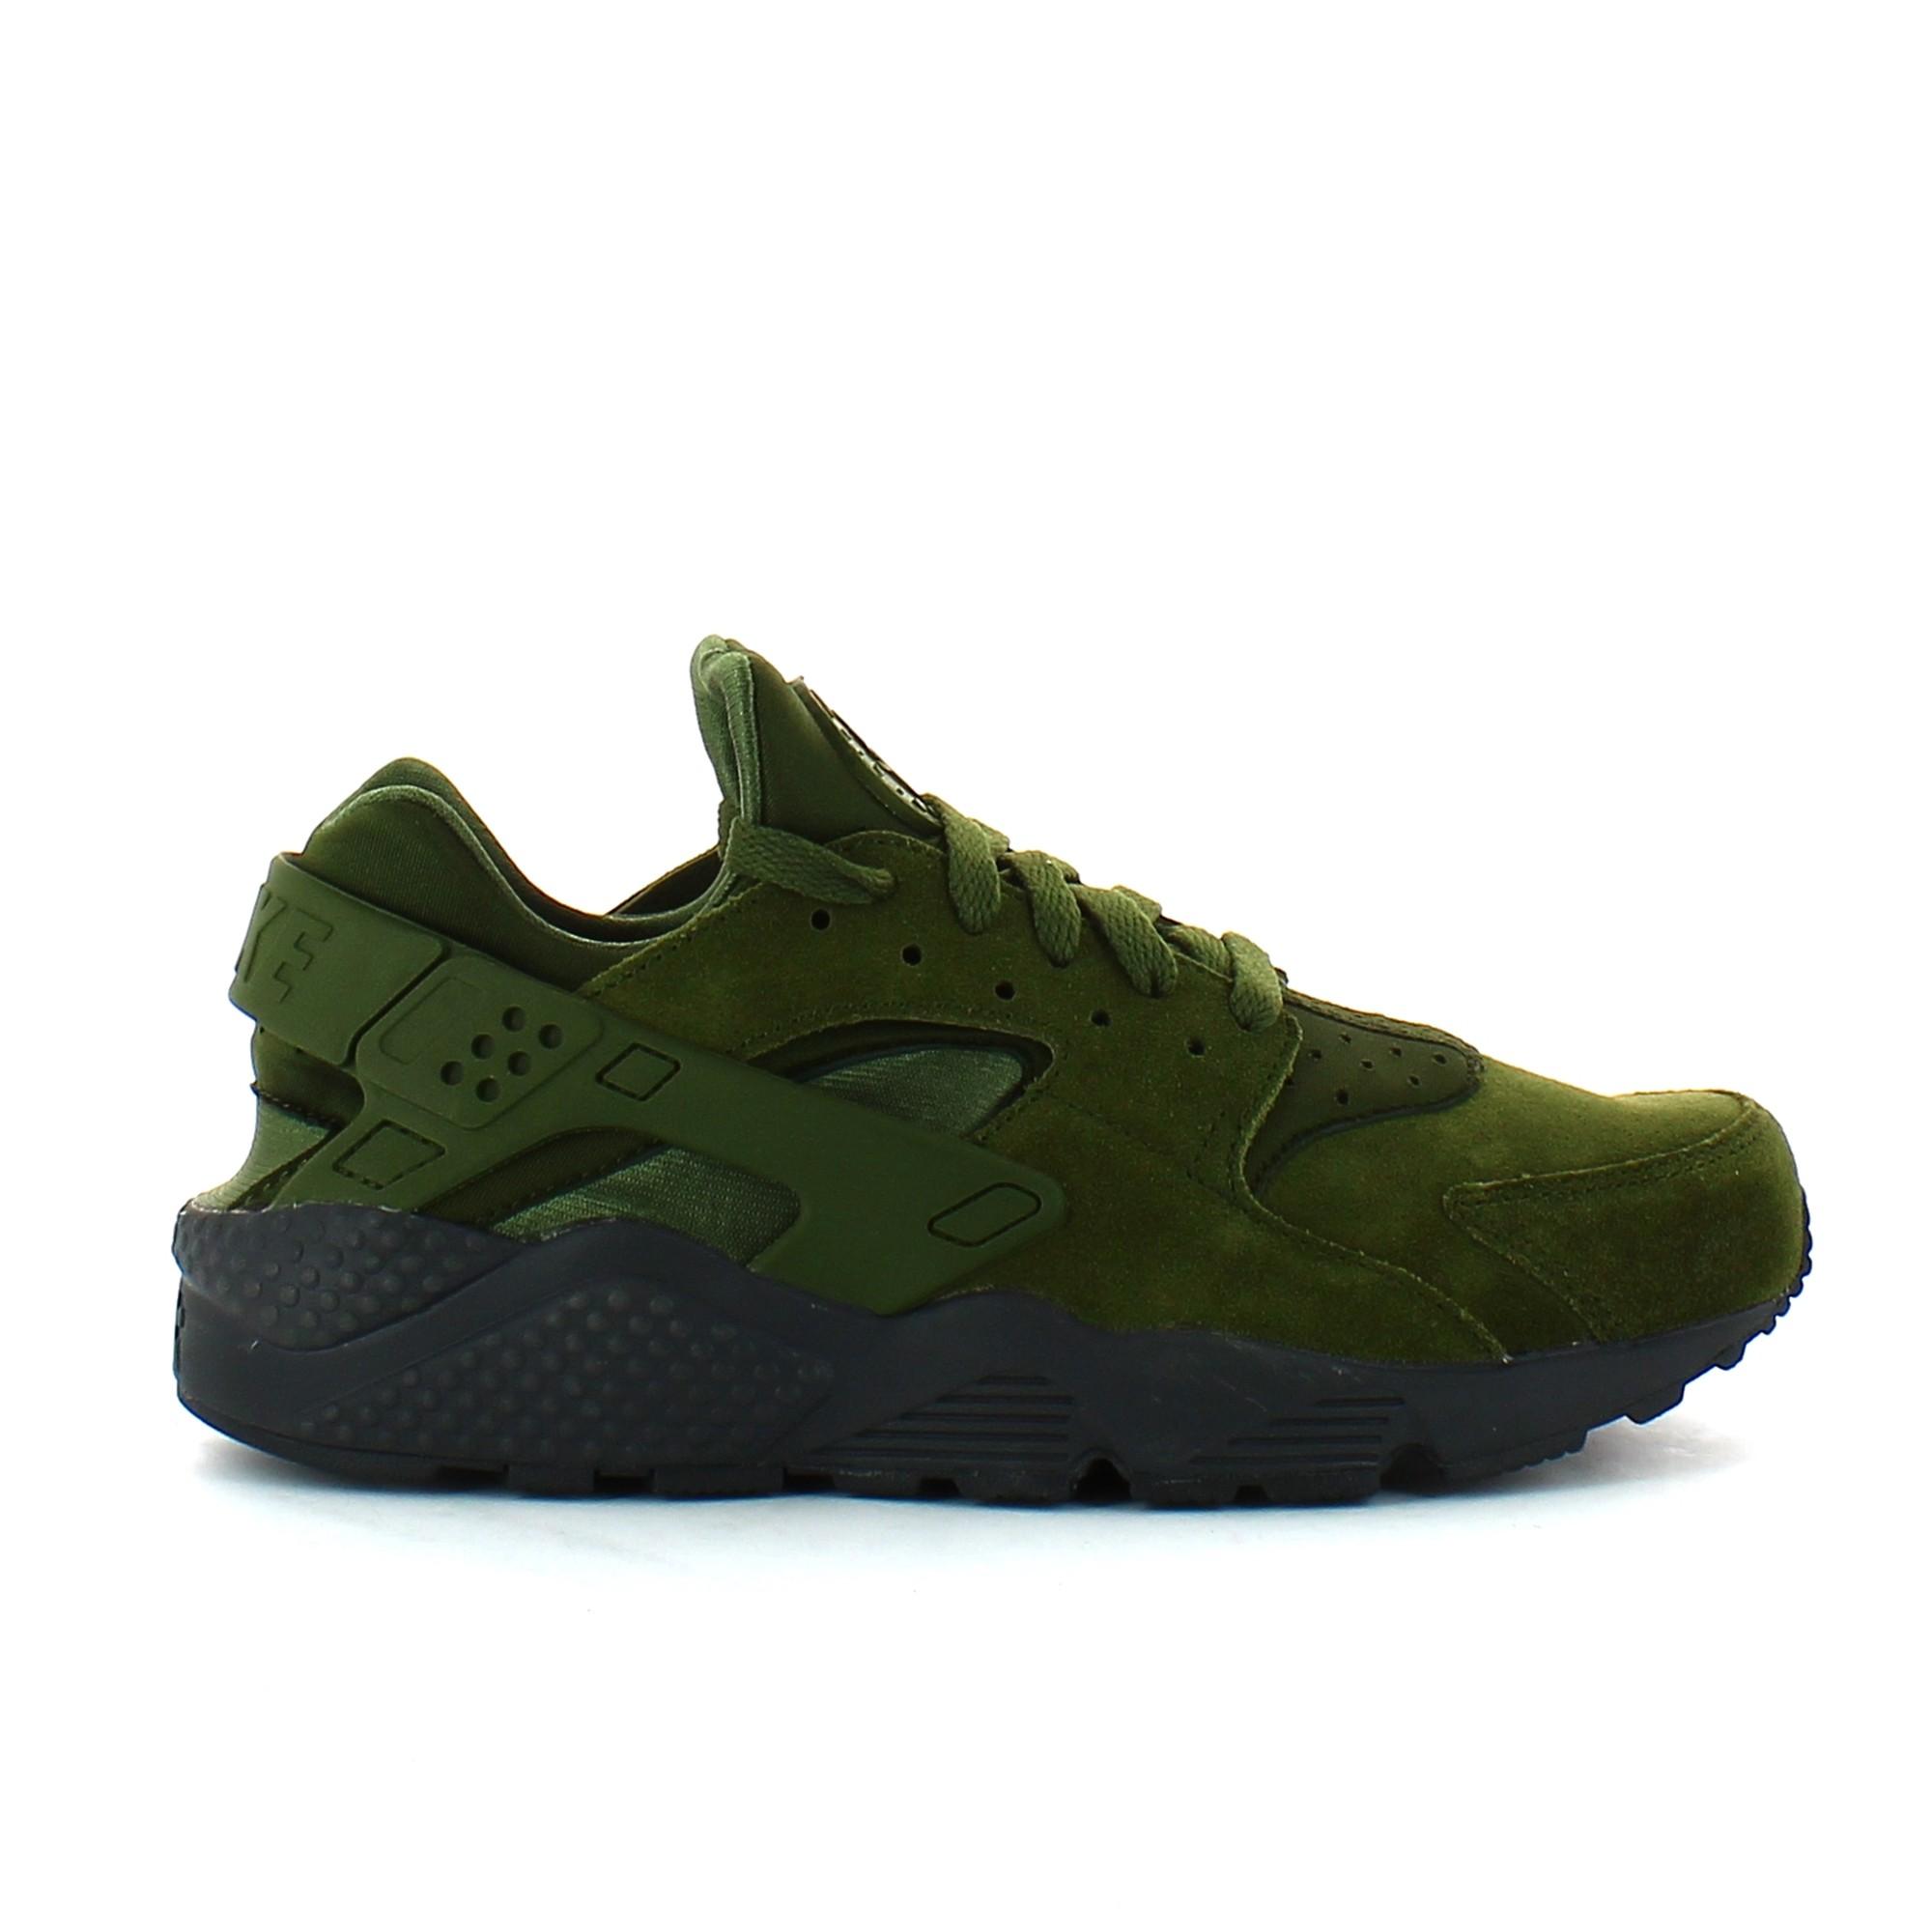 the best attitude 52626 eef63 Zapatillas Nike Air Huarache Run Se Kaki Hombre - Deportes Moya